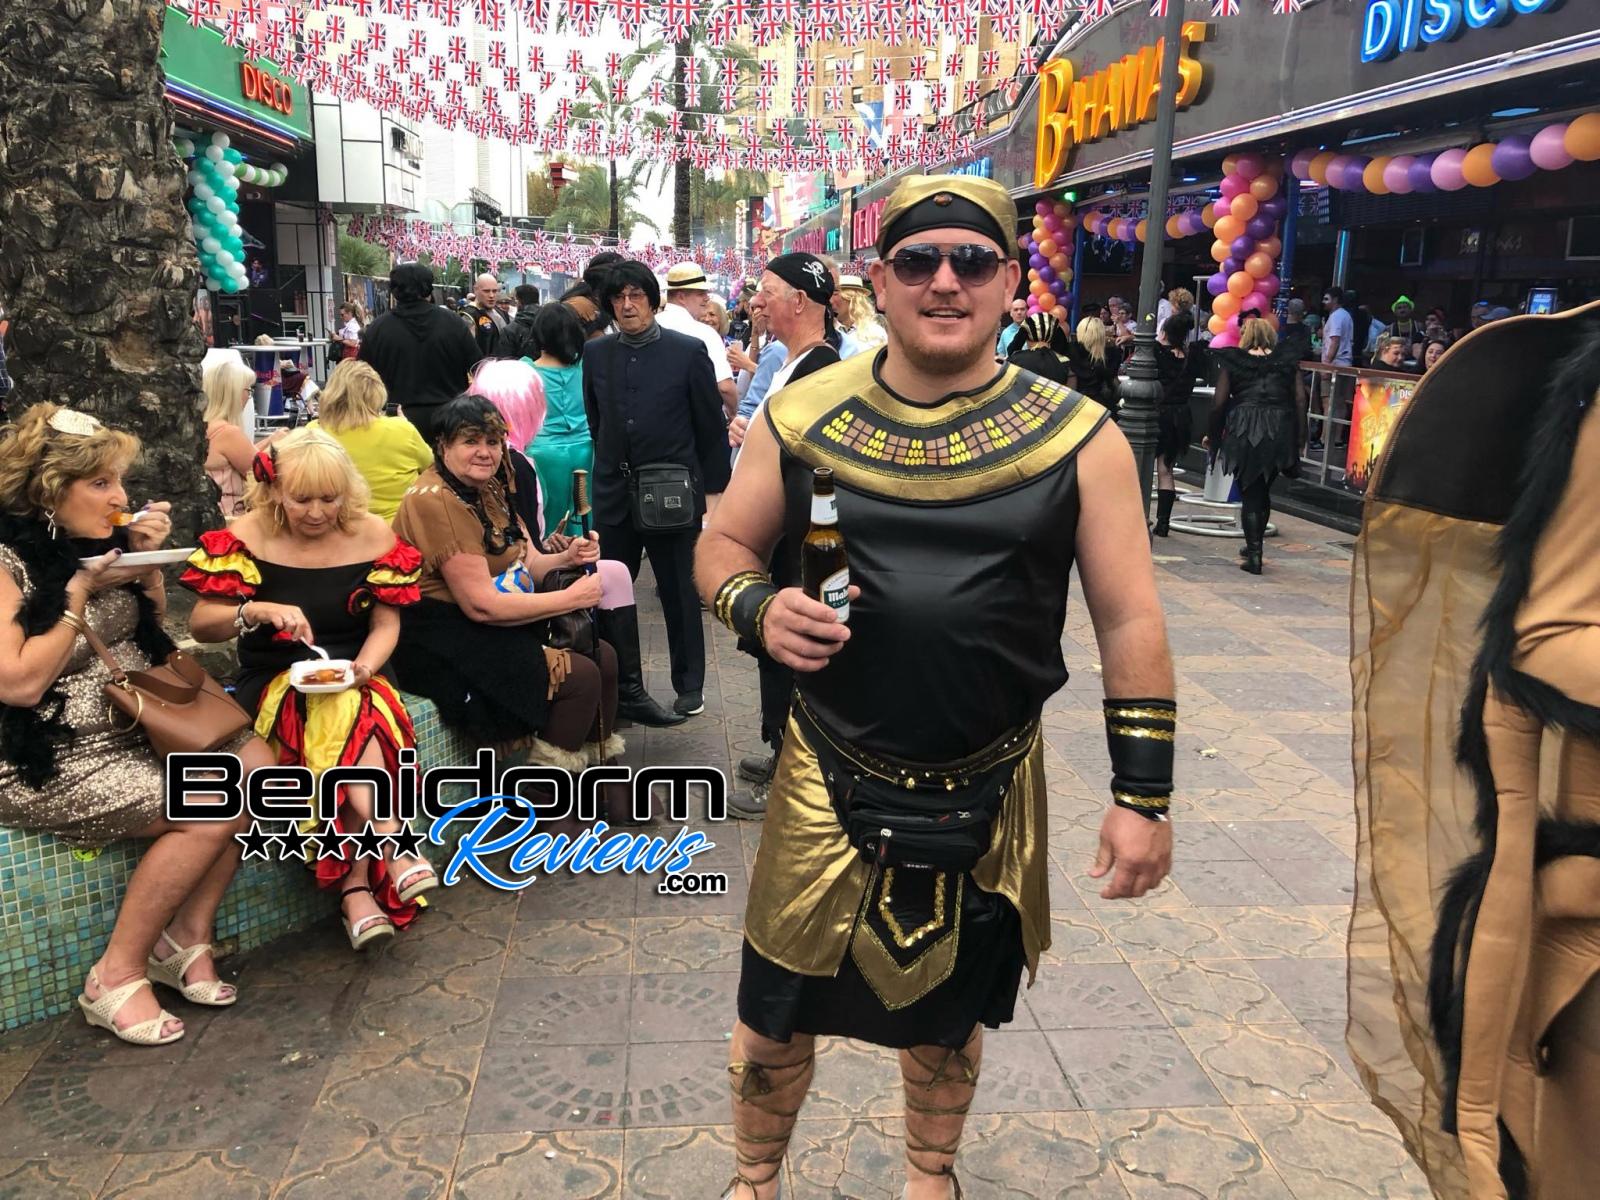 Benidorm-Fiestas-2019-Fancy-Dress-181